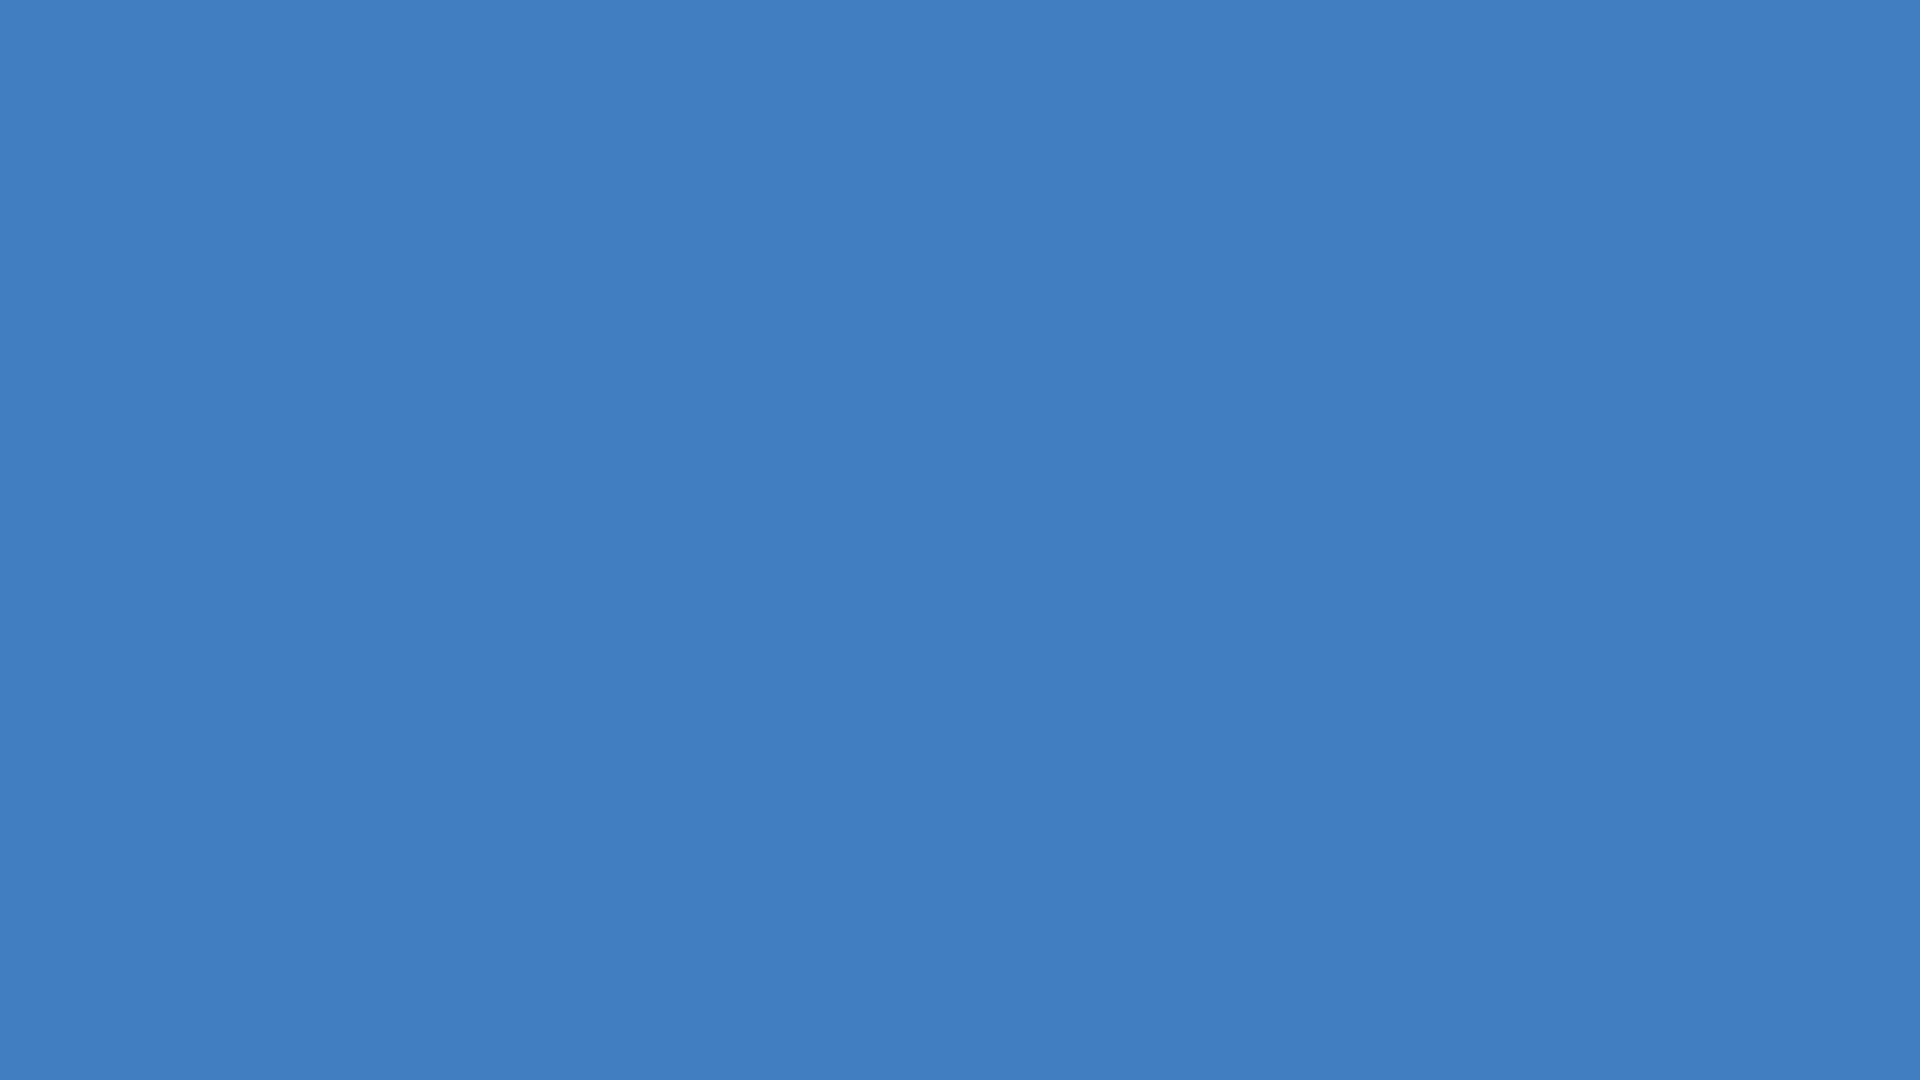 solid color hd wallpapers | pixelstalk